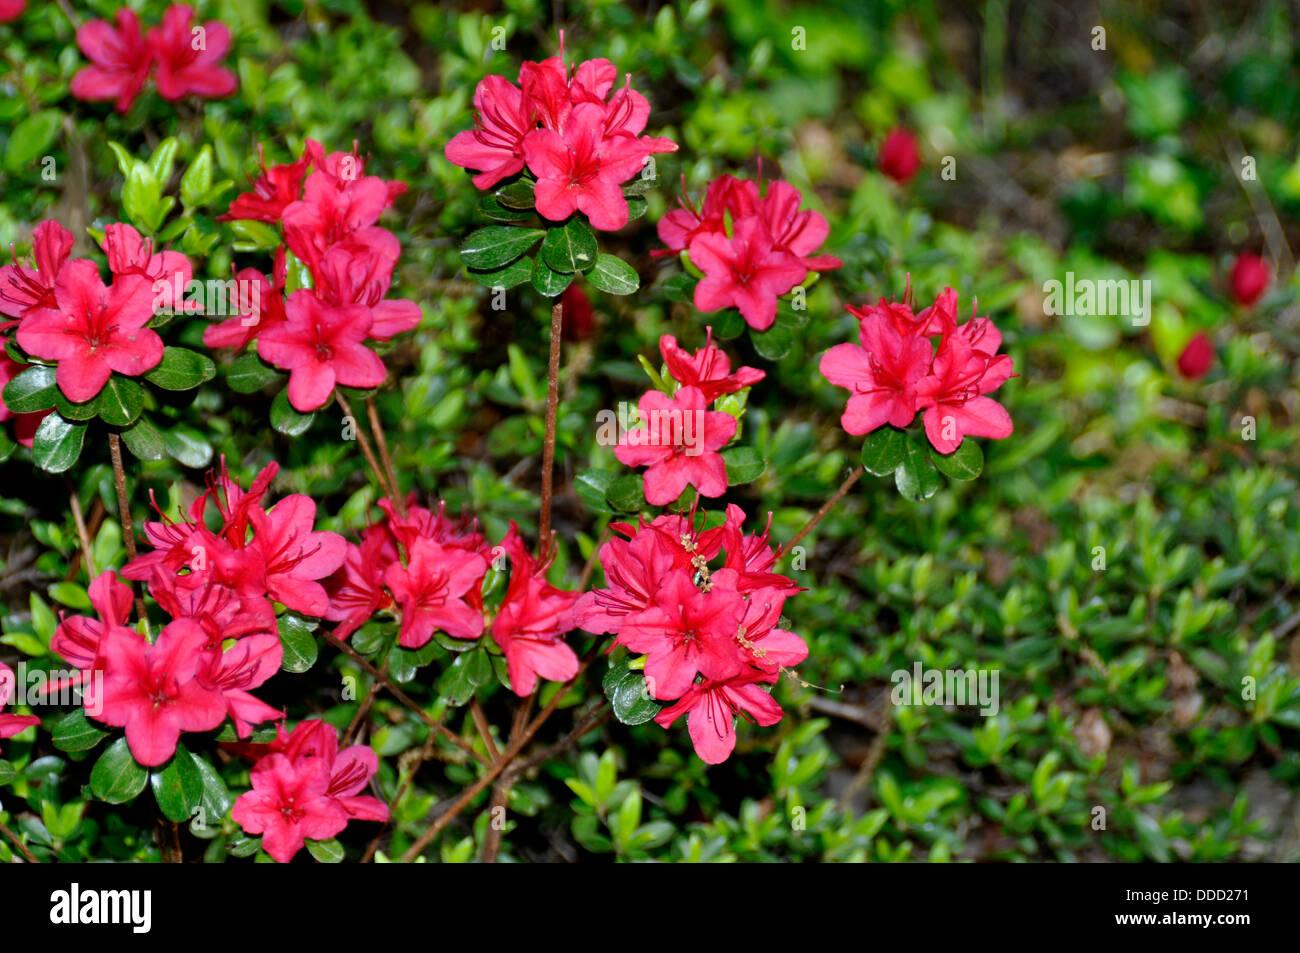 azaleas in bloom - Stock Image